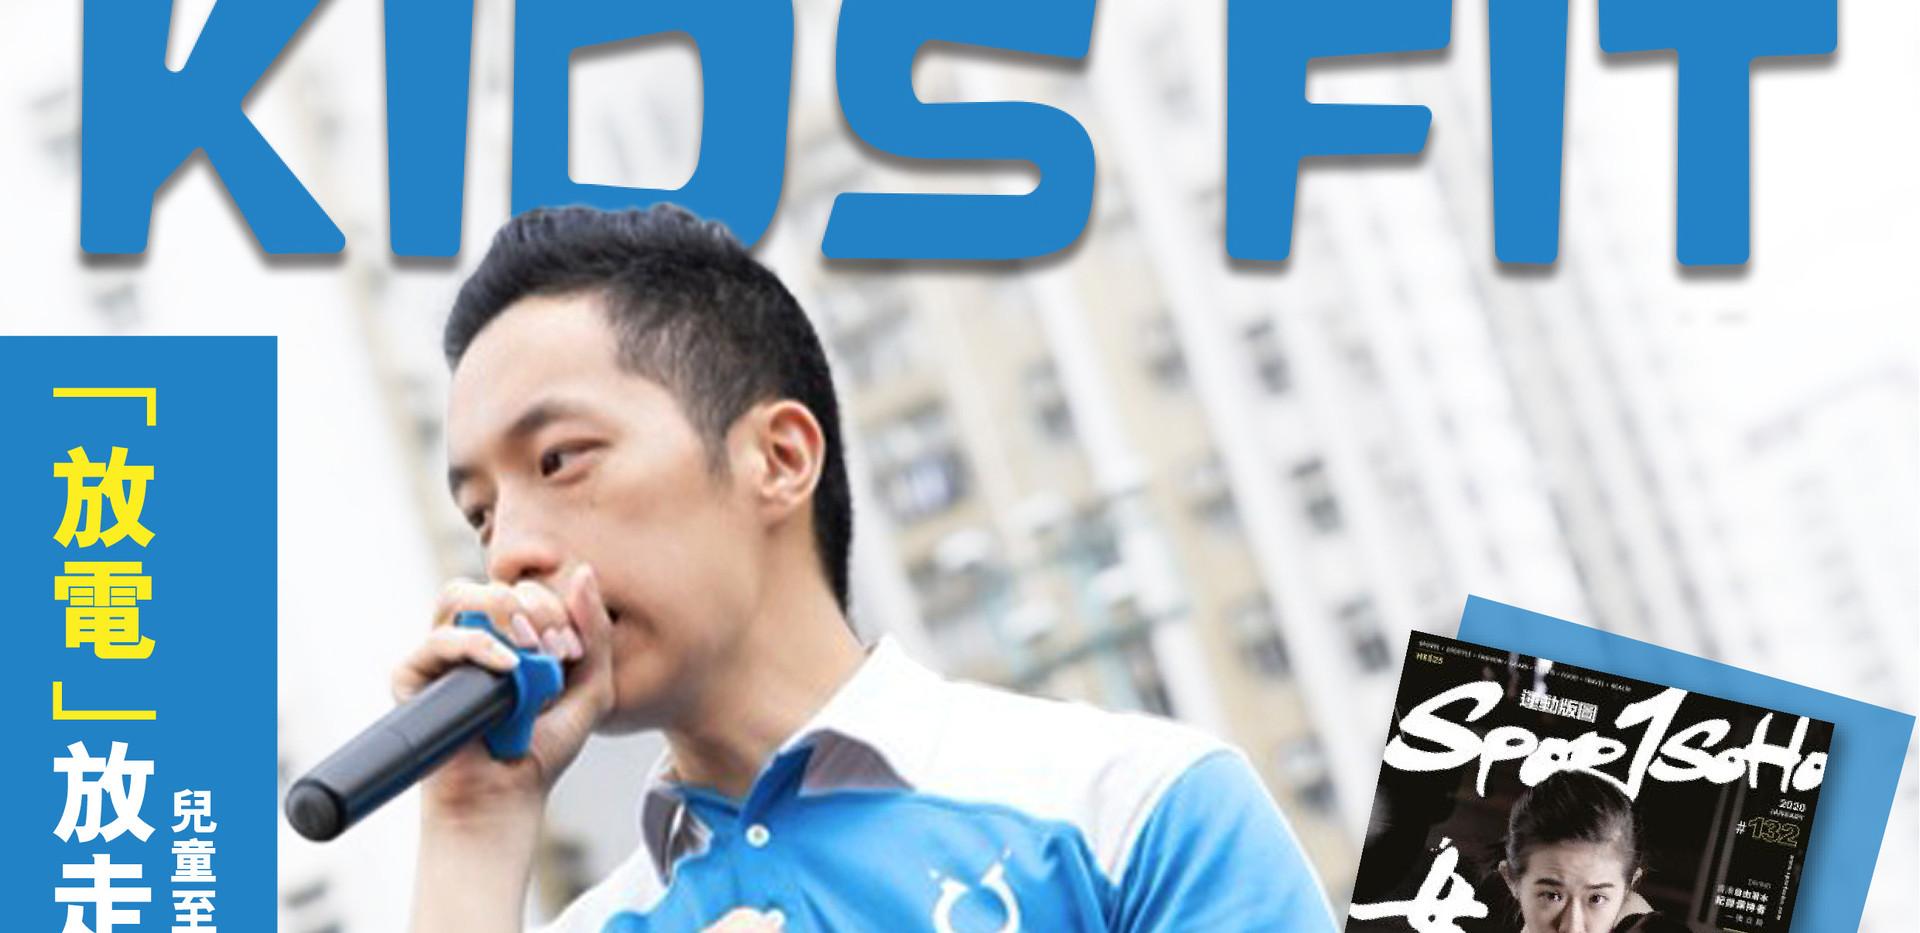 SportSoho_02_OP_工作區域 1.jpg